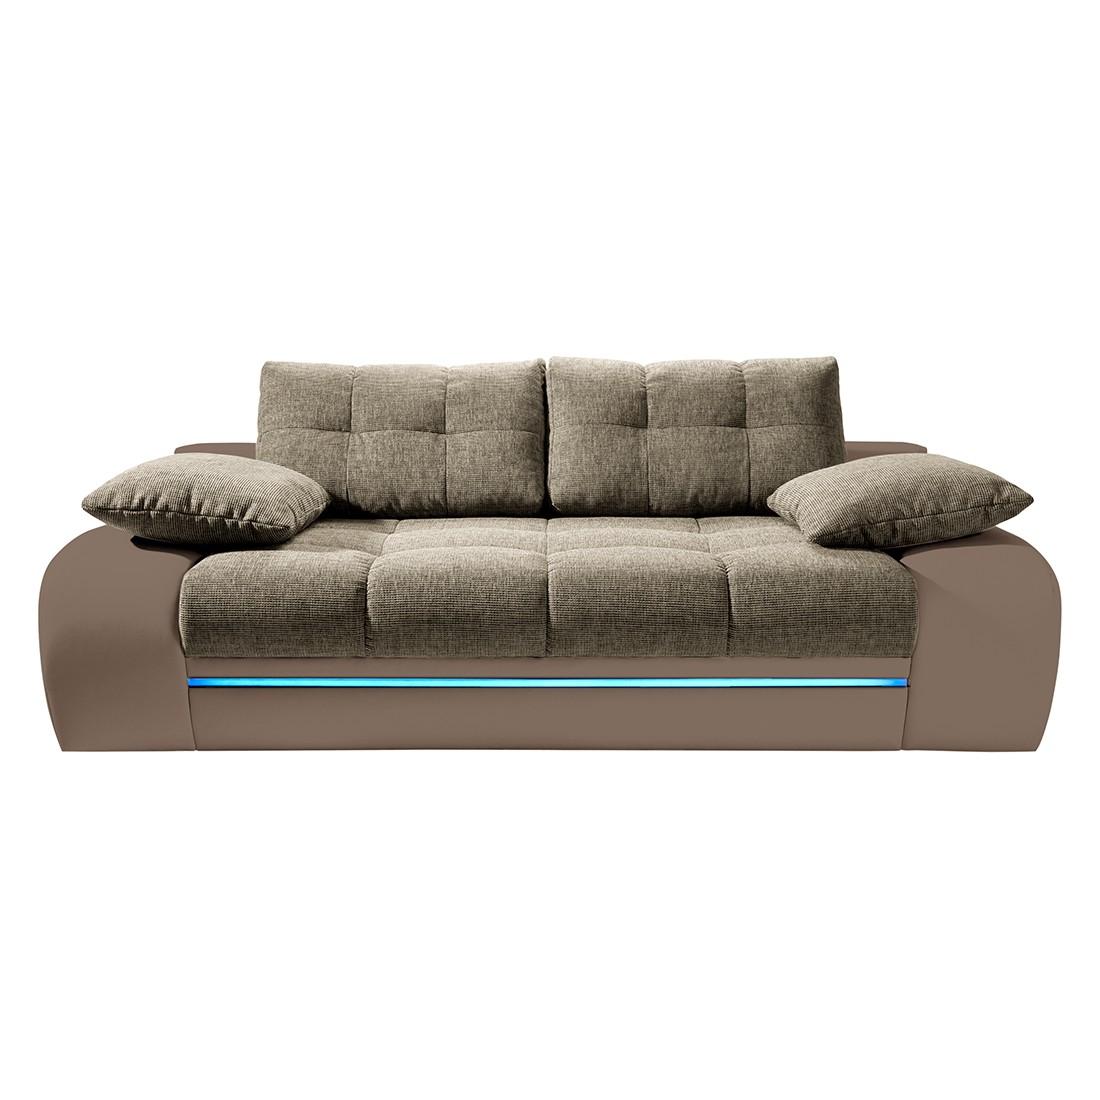 EEK A+, Schlafsofa Rainbowlight (mit RGB-LED-Beleuchtung) – Kunstleder Cappuccino /Strukturstoff Macciato, loftscape jetzt bestellen